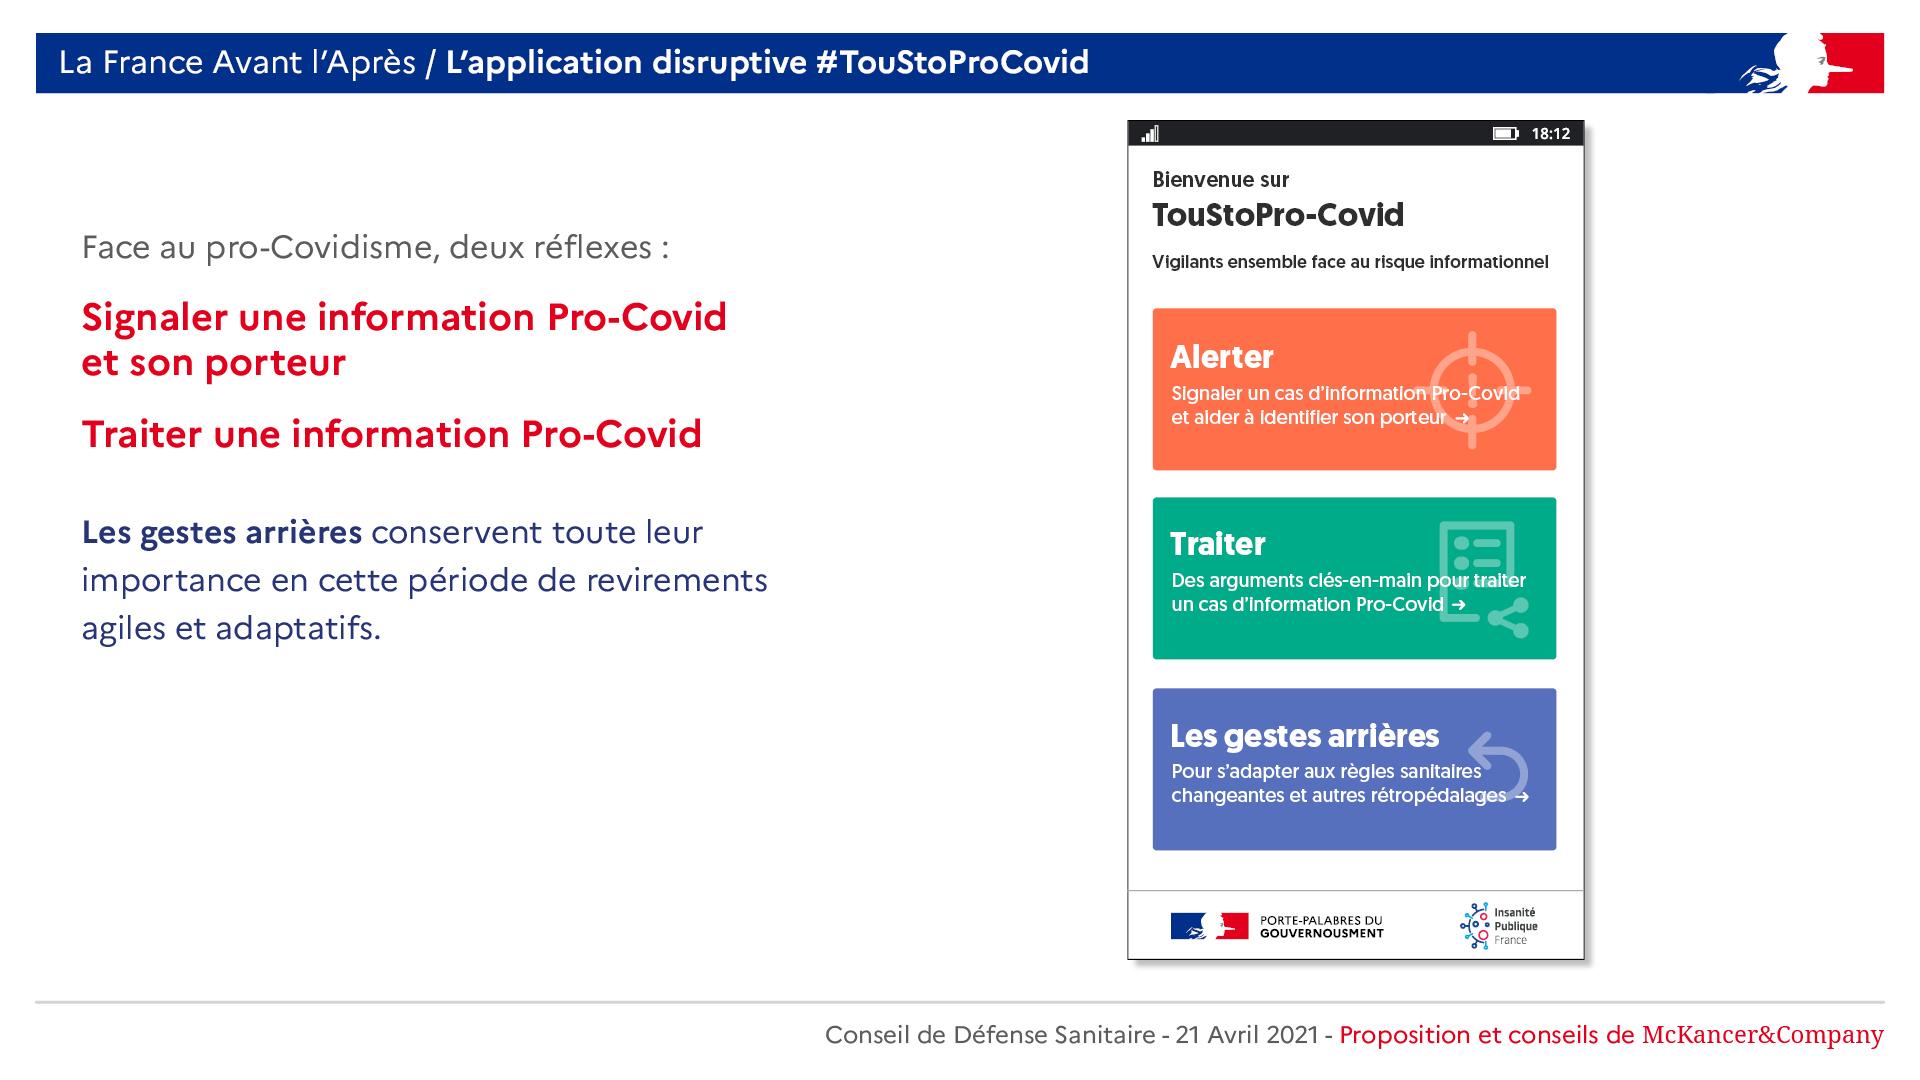 Gouvernousment - App TouStoProCovid